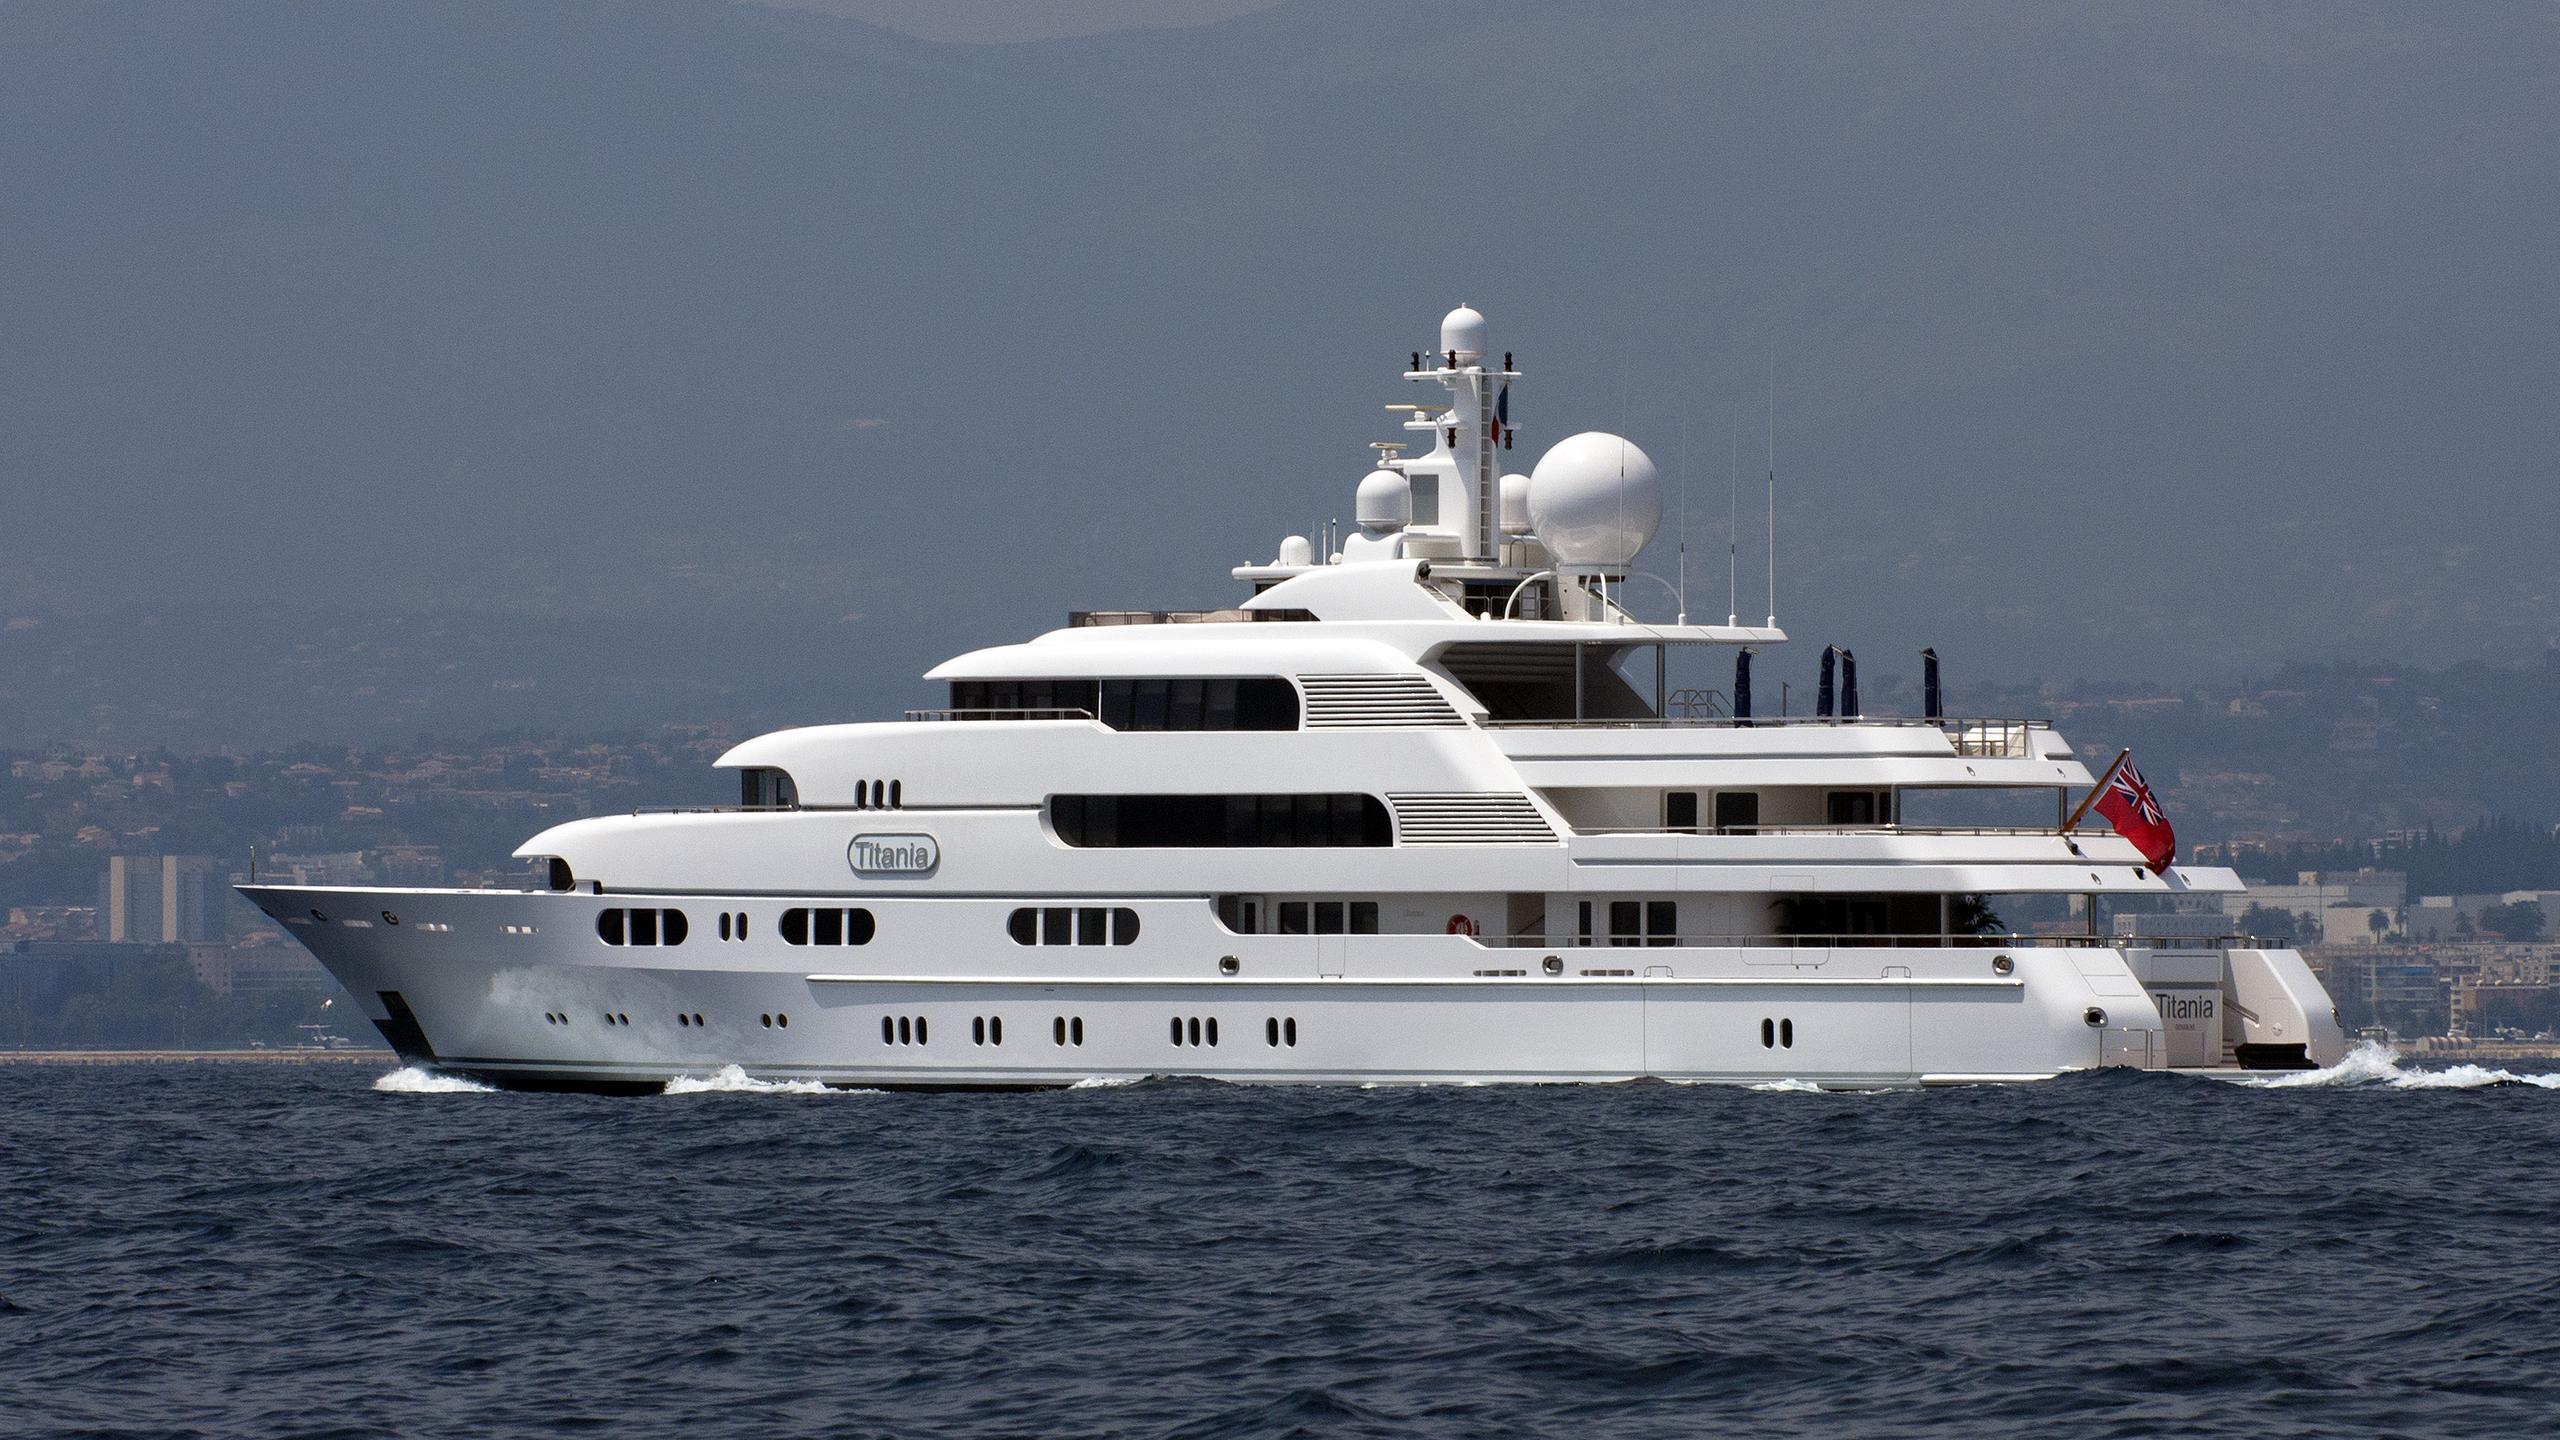 titania-motor-yacht-lurssen-2006-72m-half-profile-stern